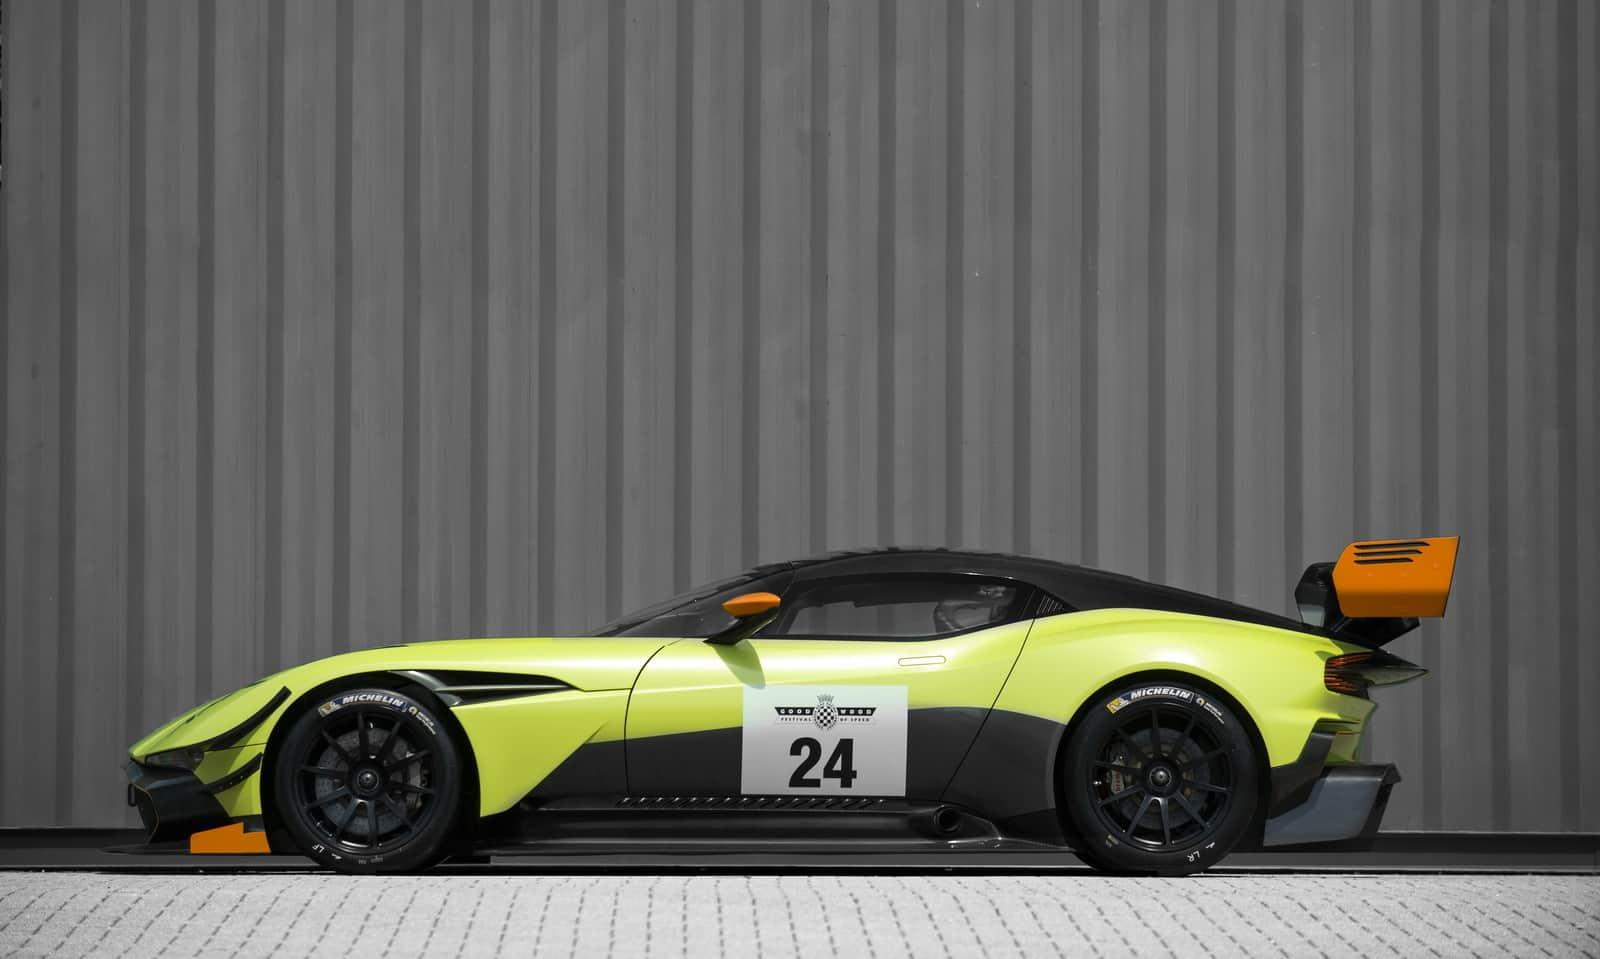 Aston Martin Vulcan AMR PRO 7